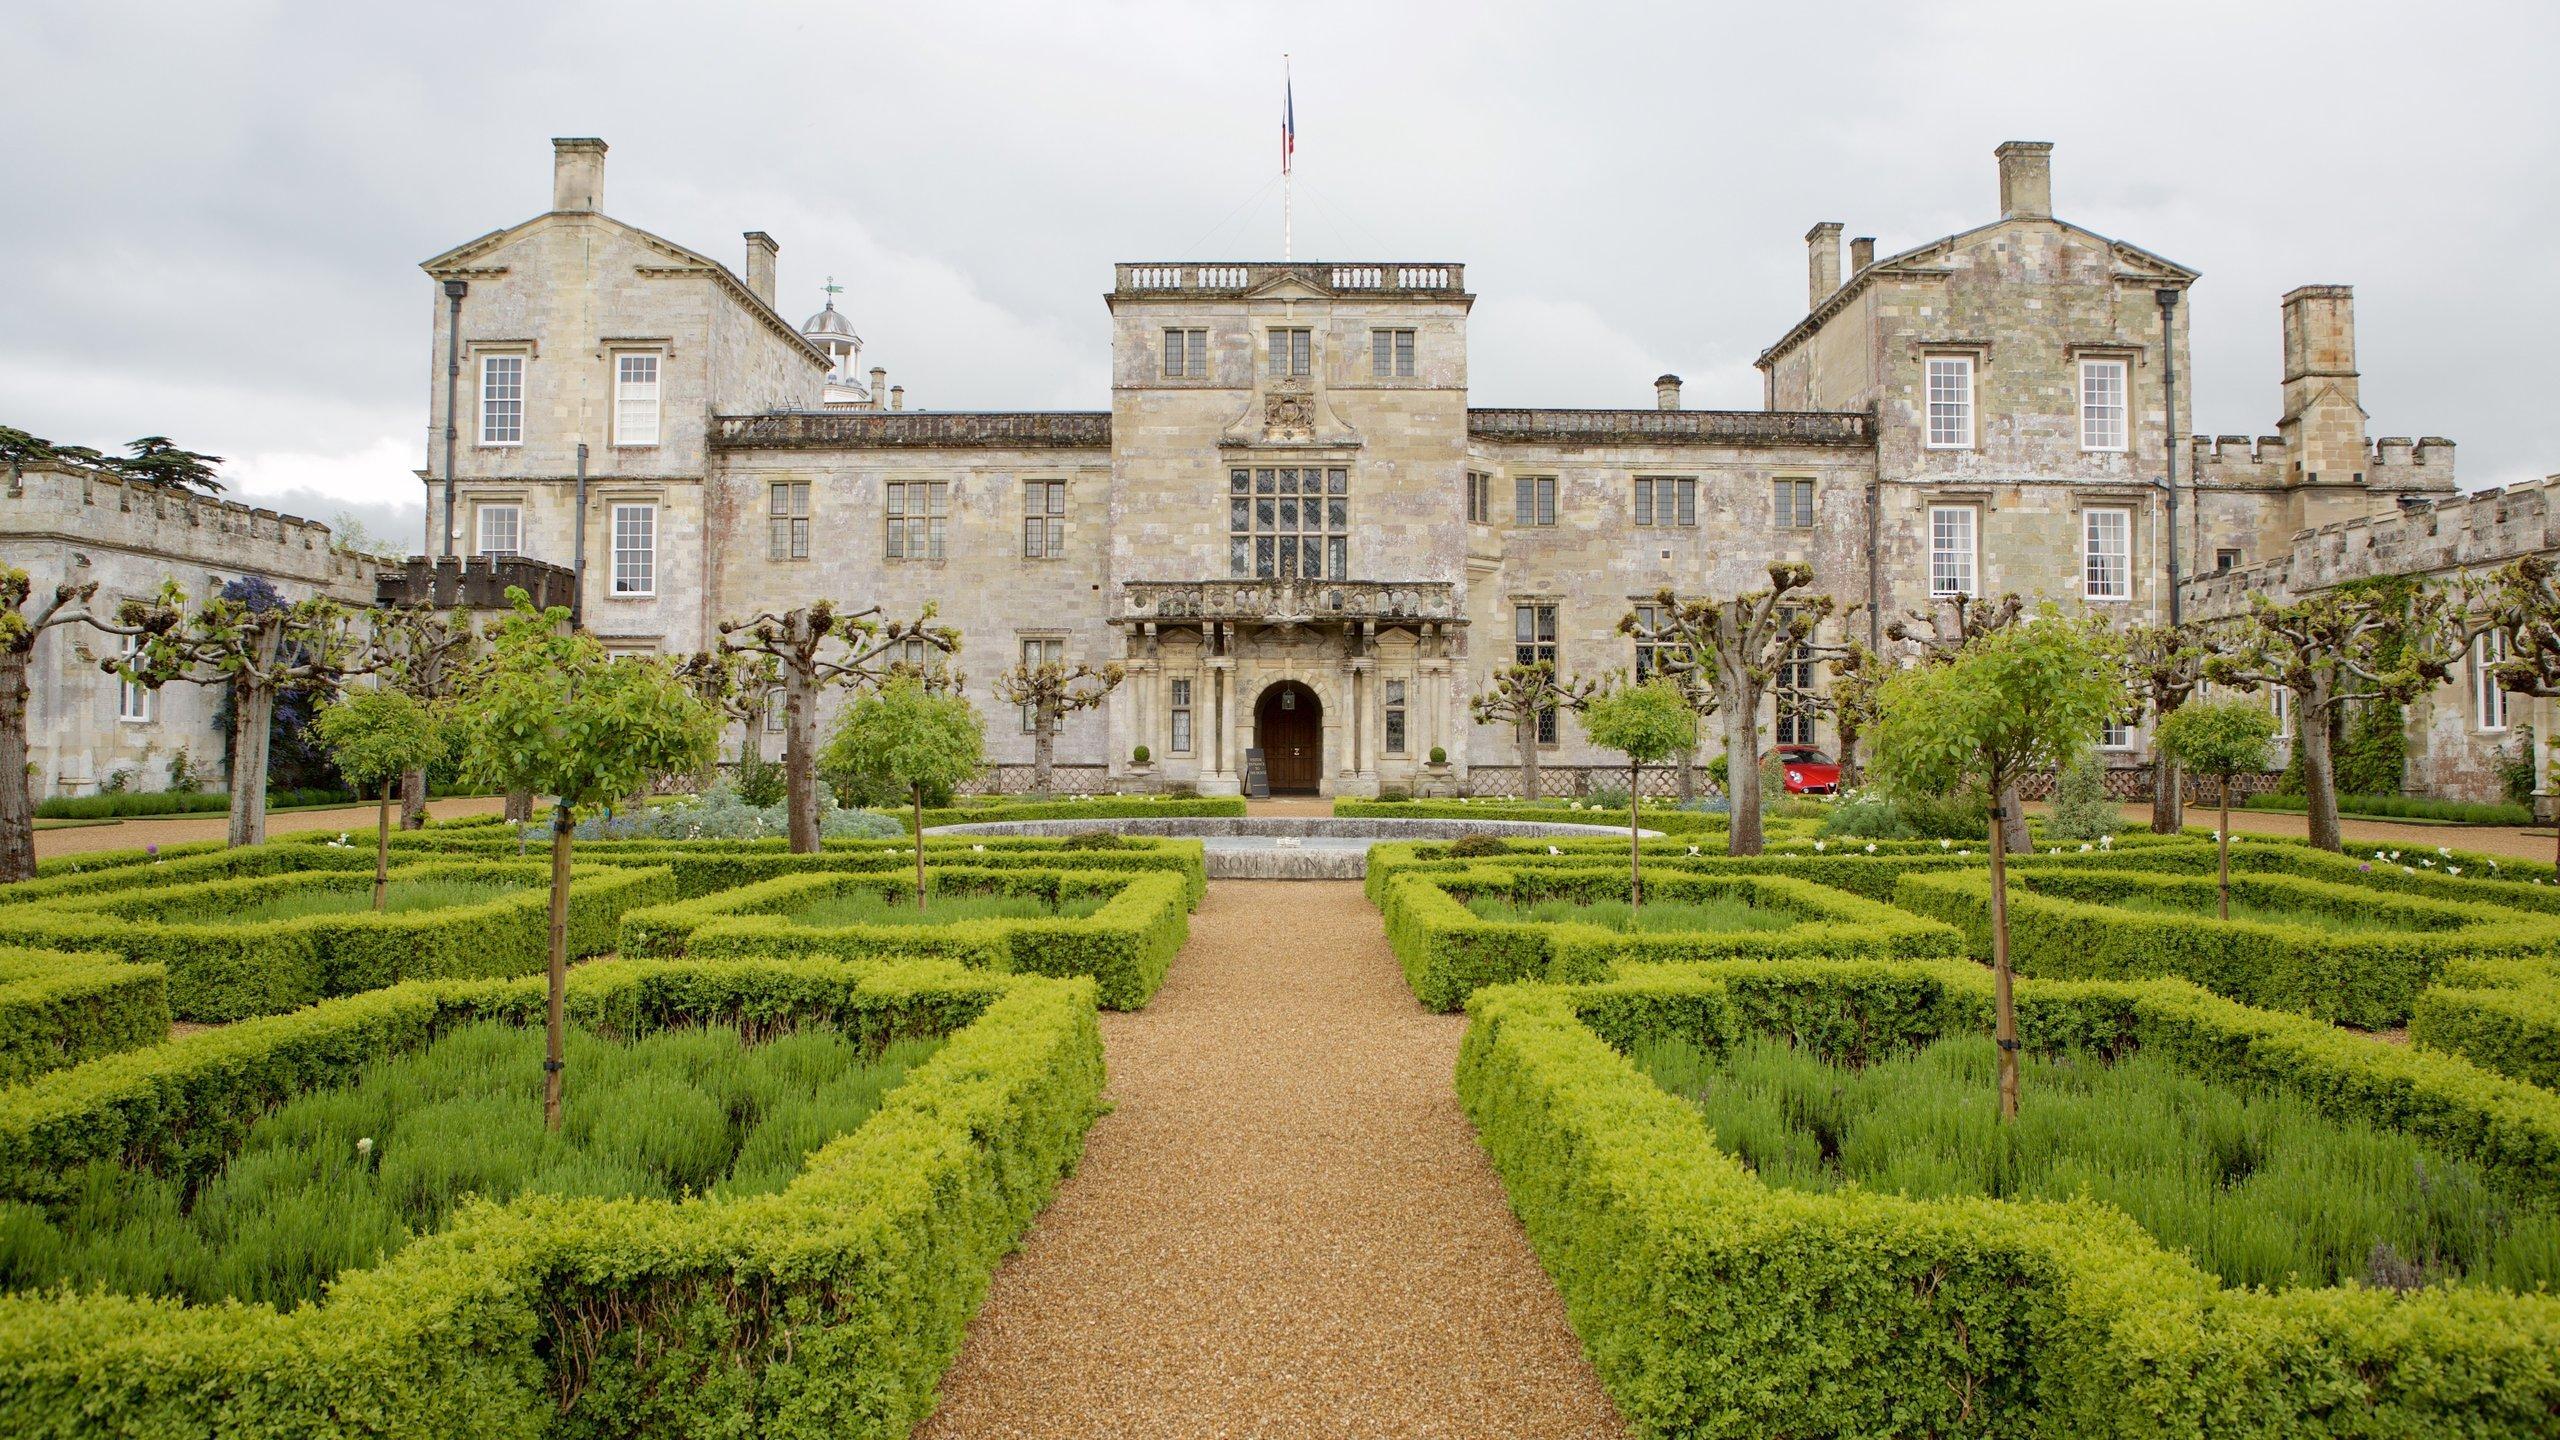 Wilton House, Salisbury, England, United Kingdom